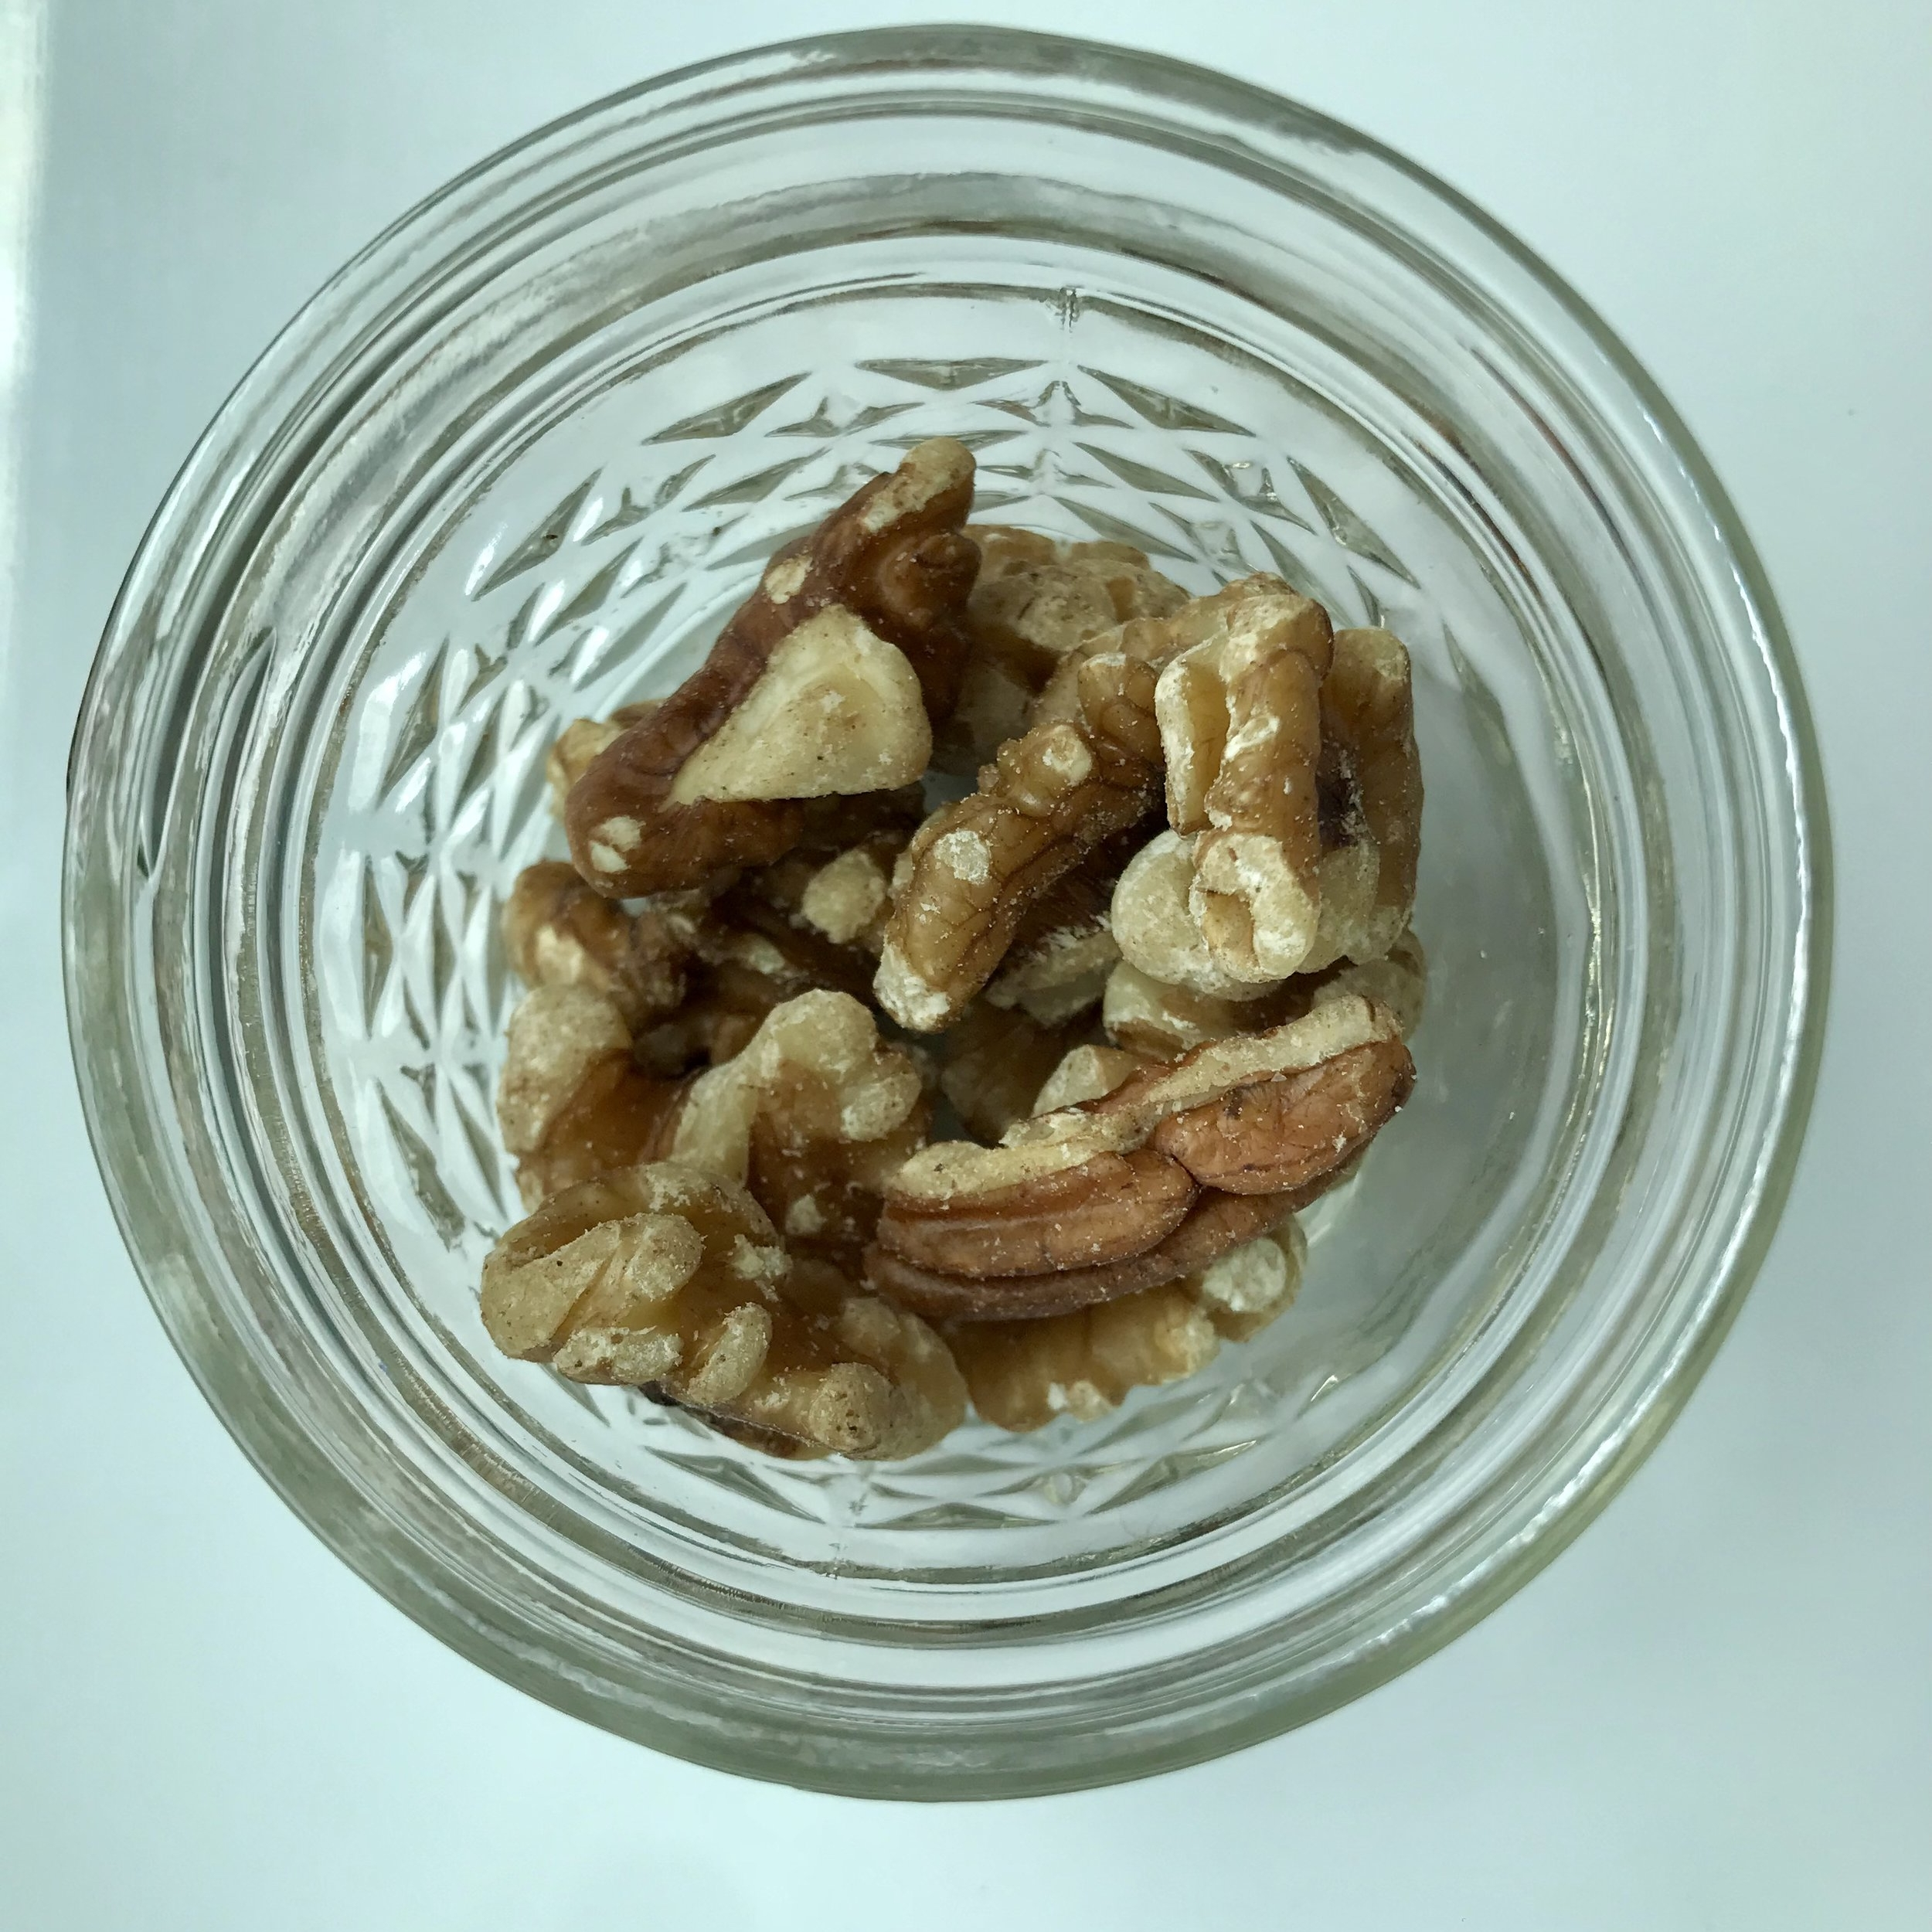 100-calorie-walnuts.jpg